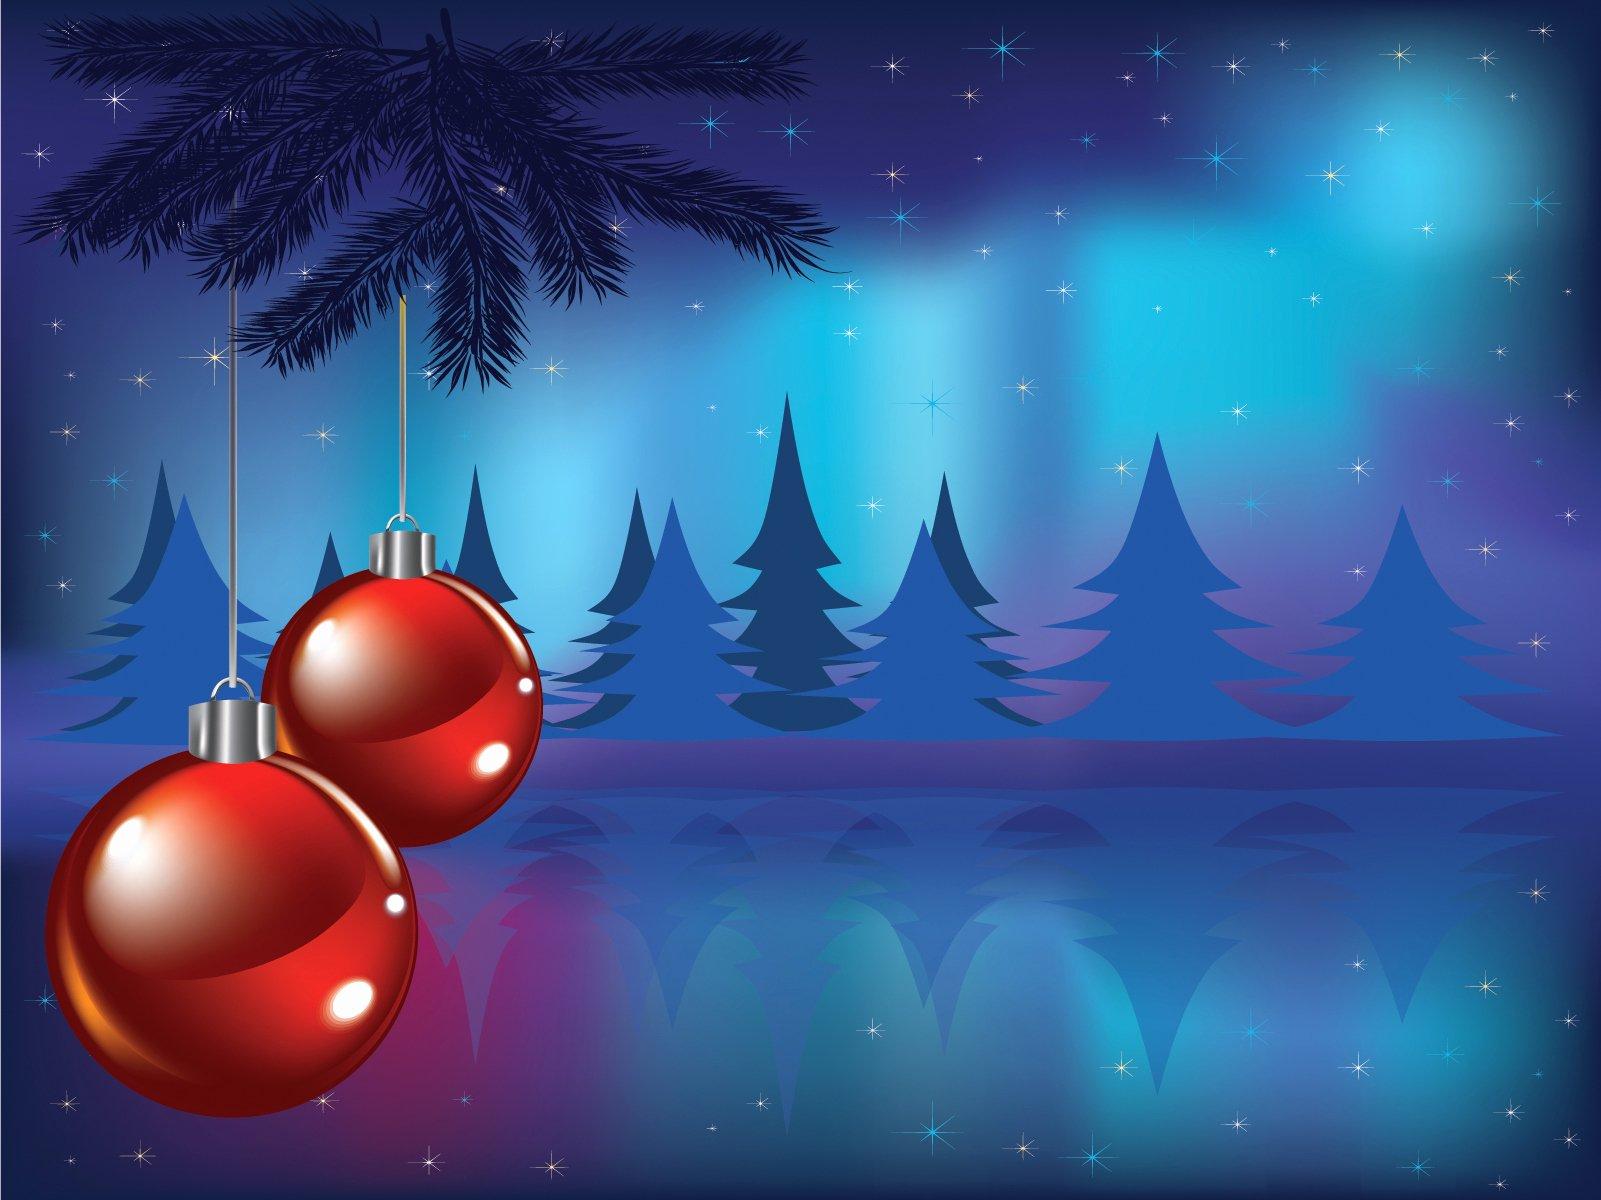 Christmas Card Powerpoint Templates Blue Christmas